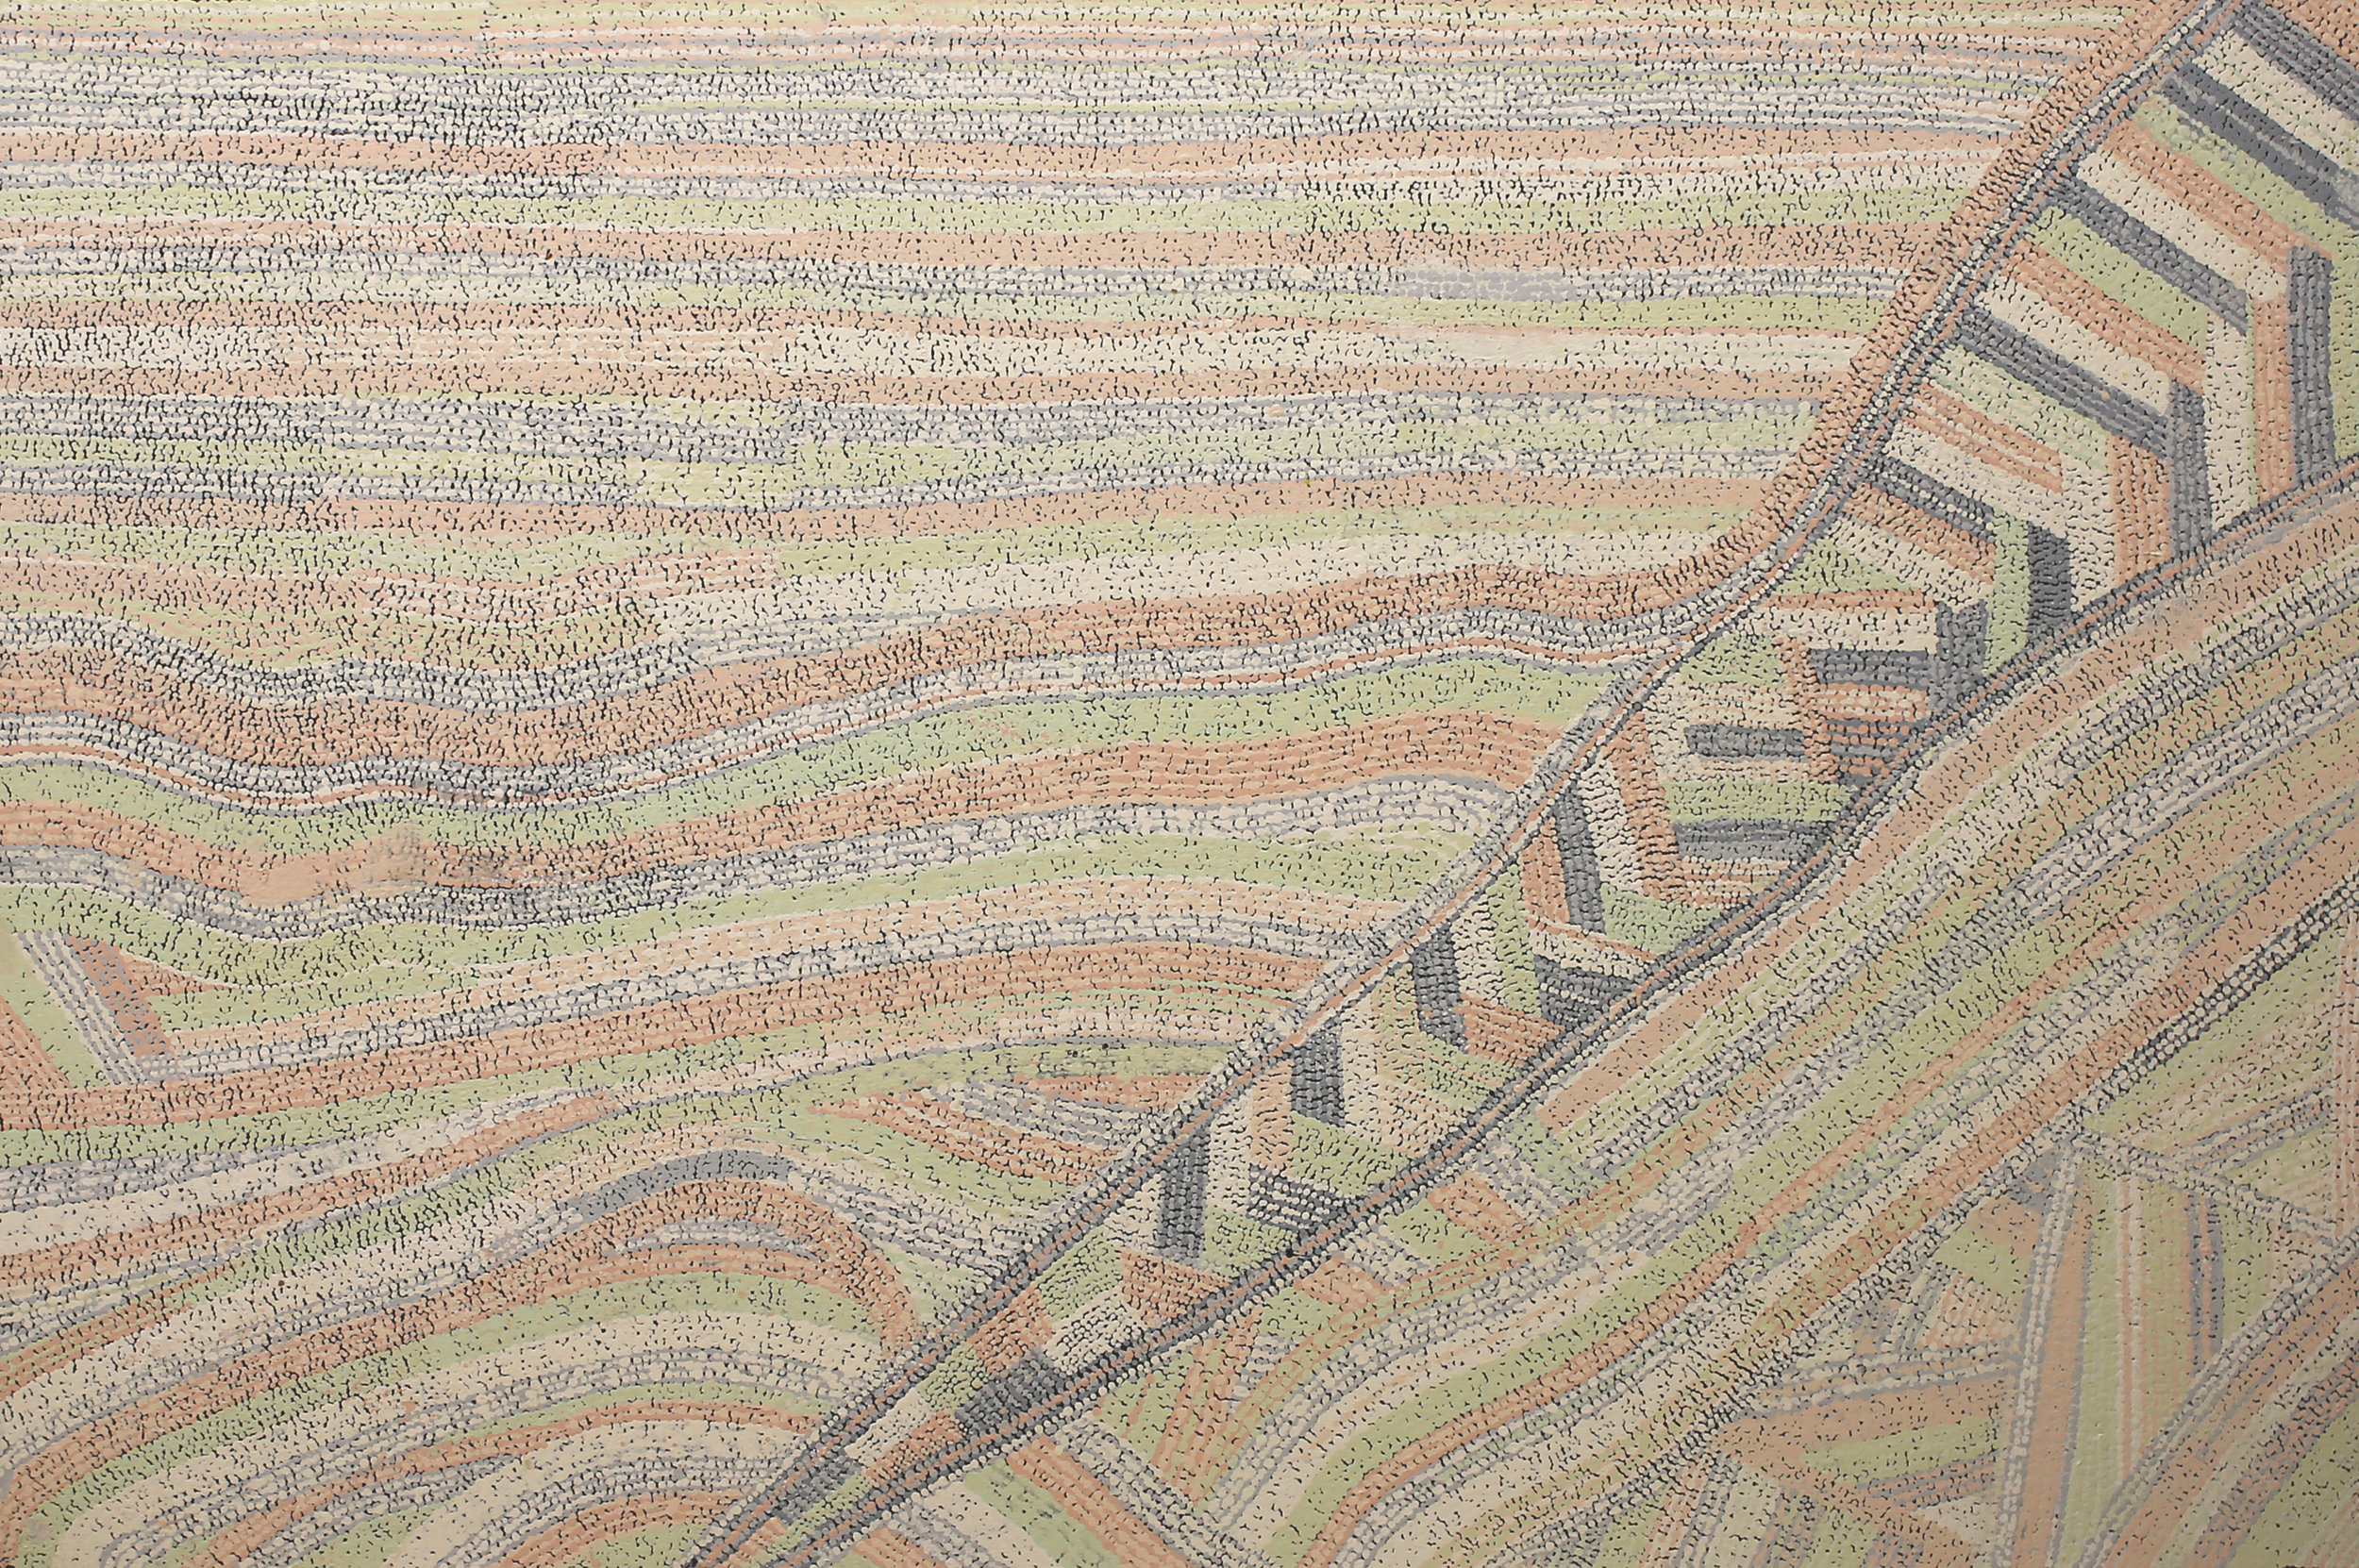 YURIPYA LIONEL  Anumara, 2017  1000 x 1500mm Acrylic on Linen Catalog #402-17   EMAIL INQUIRY